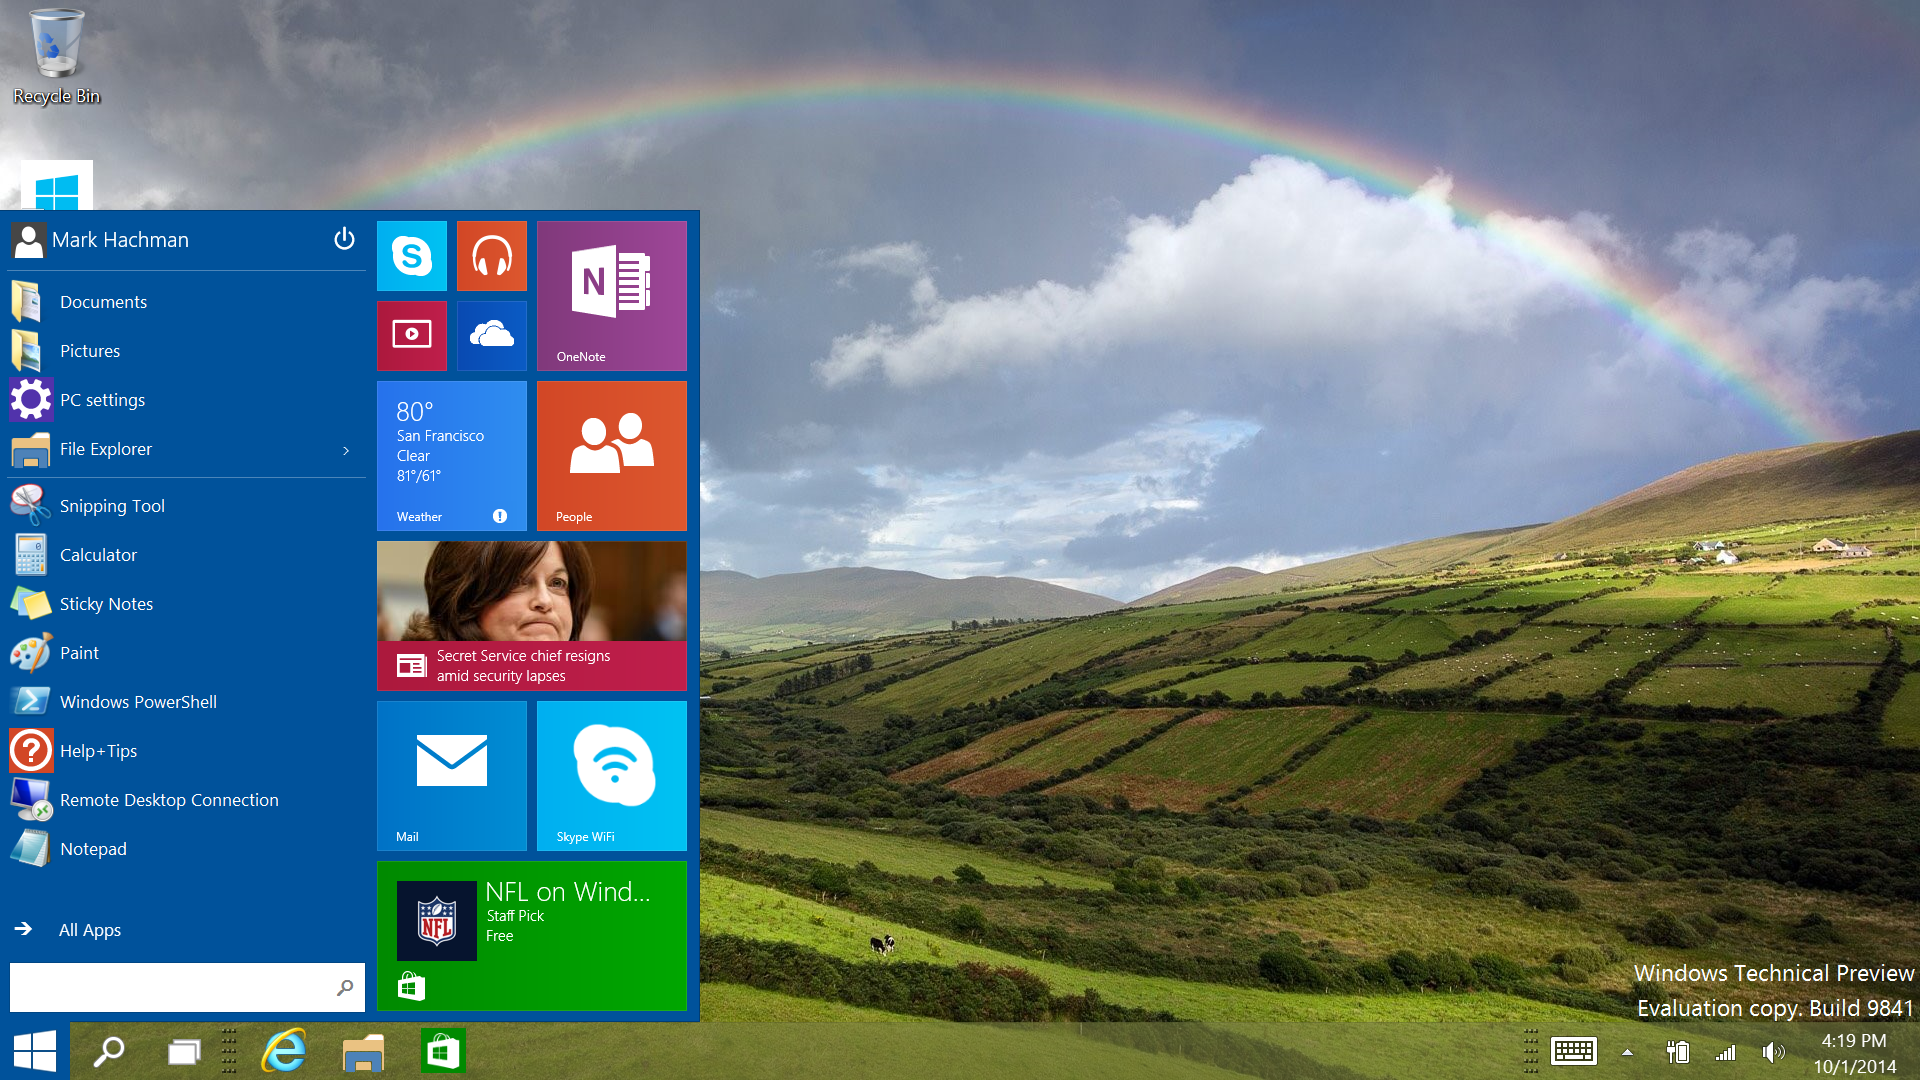 Wallpaper Folder Windows 10